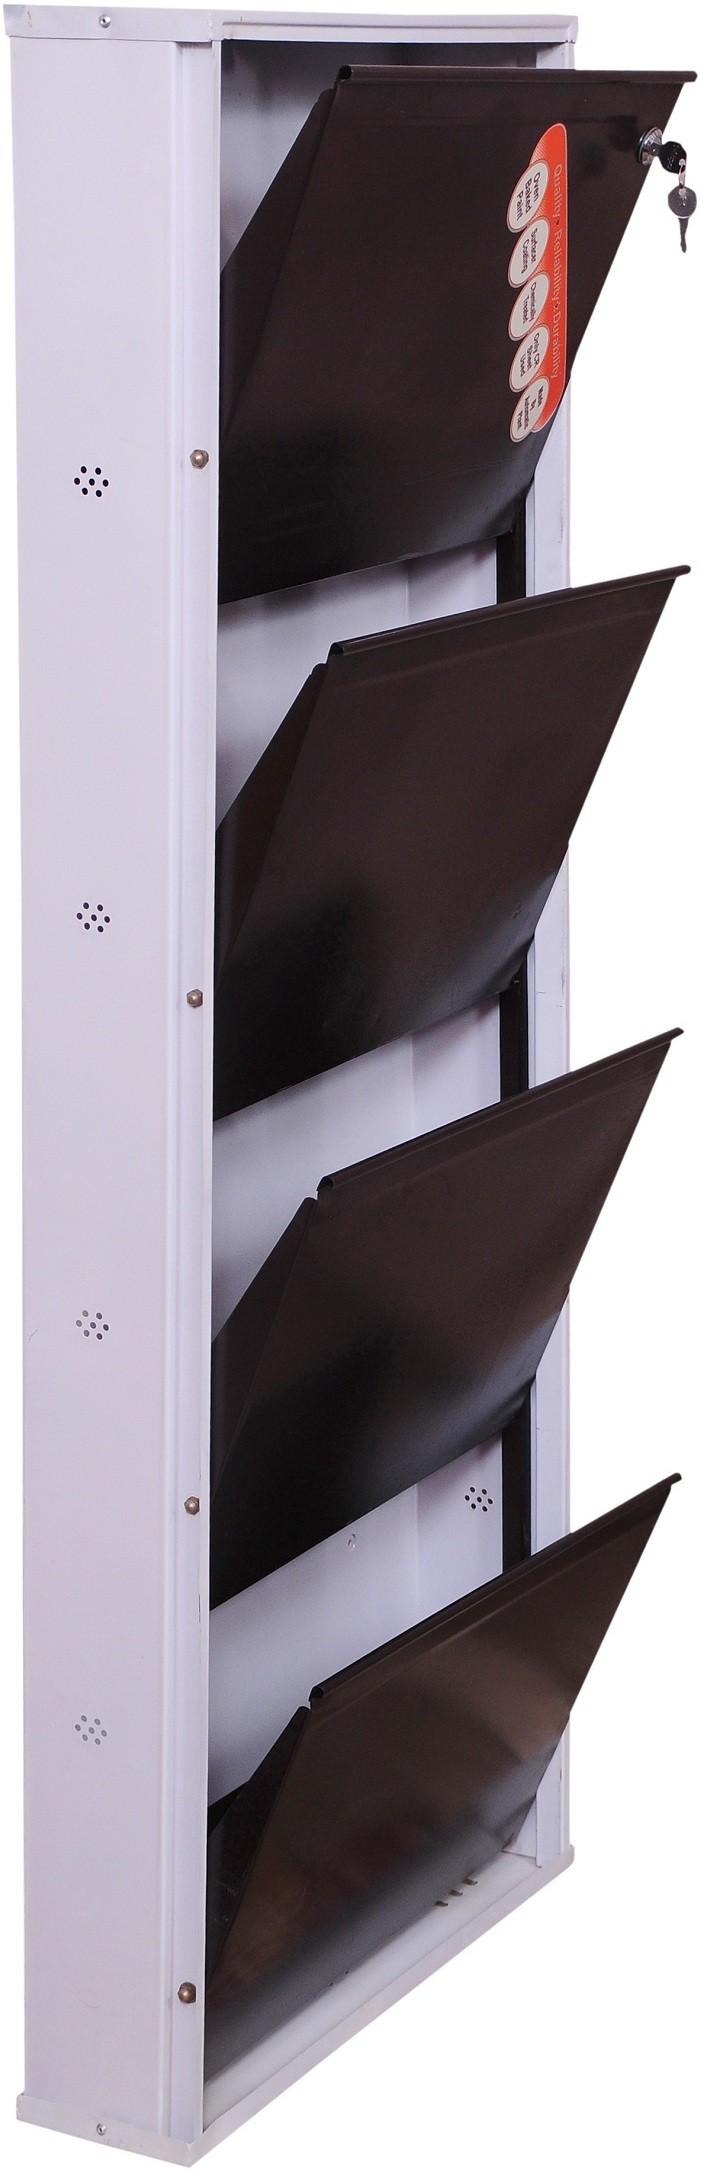 View Brats N Angels Carbon Steel Shoe Cabinet(4 Shelves) Furniture (Brats N Angels)